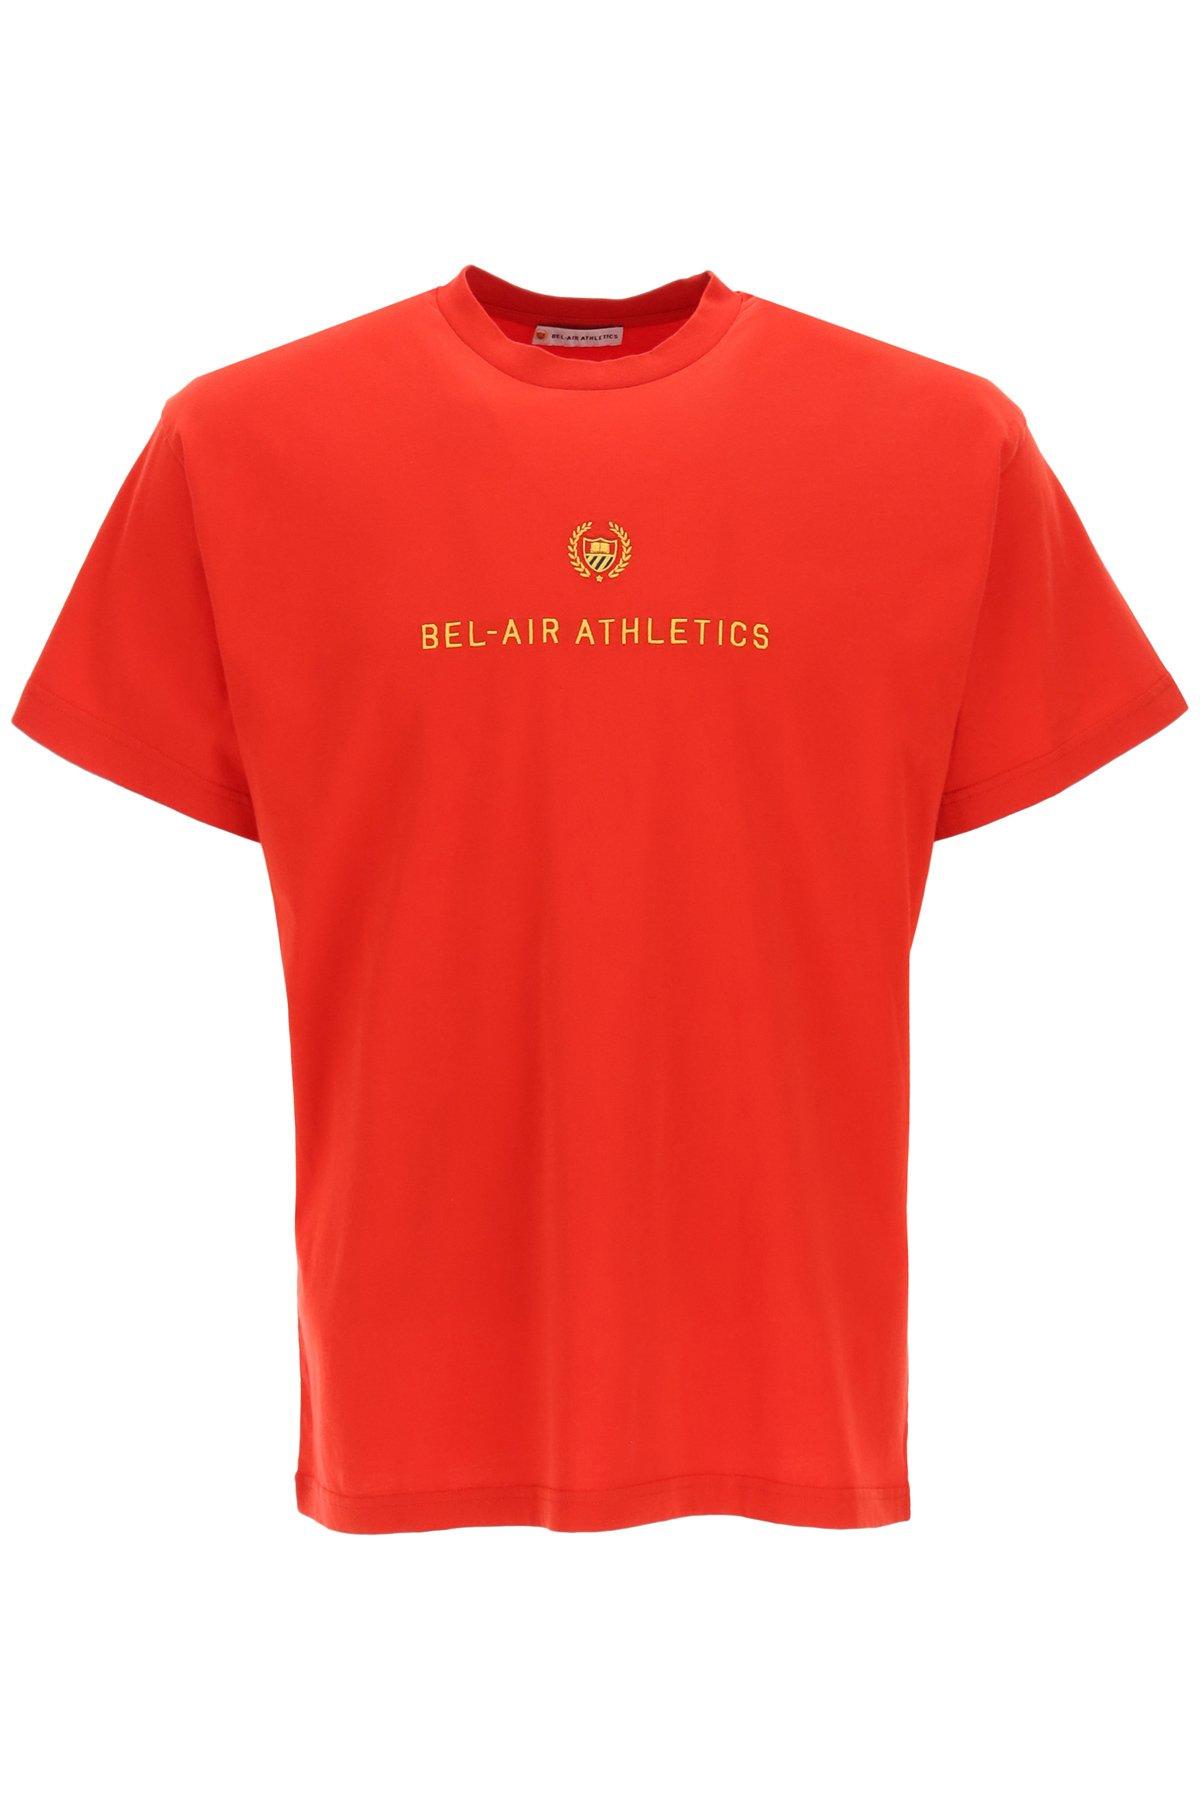 Bel-air athletics t-shirt academy crest